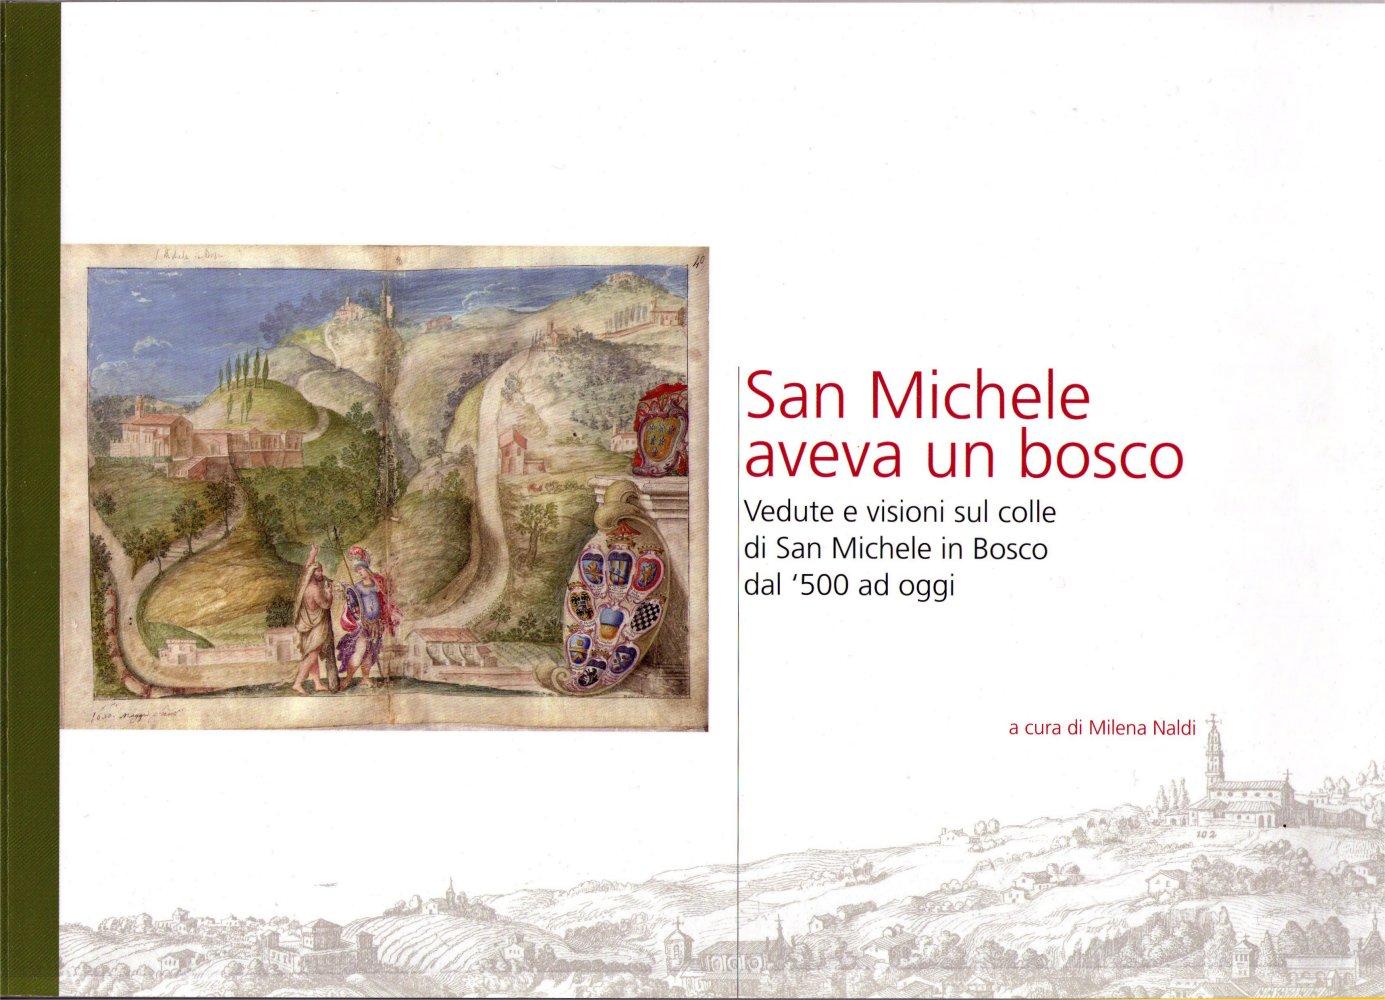 San Michele aveva un bosco